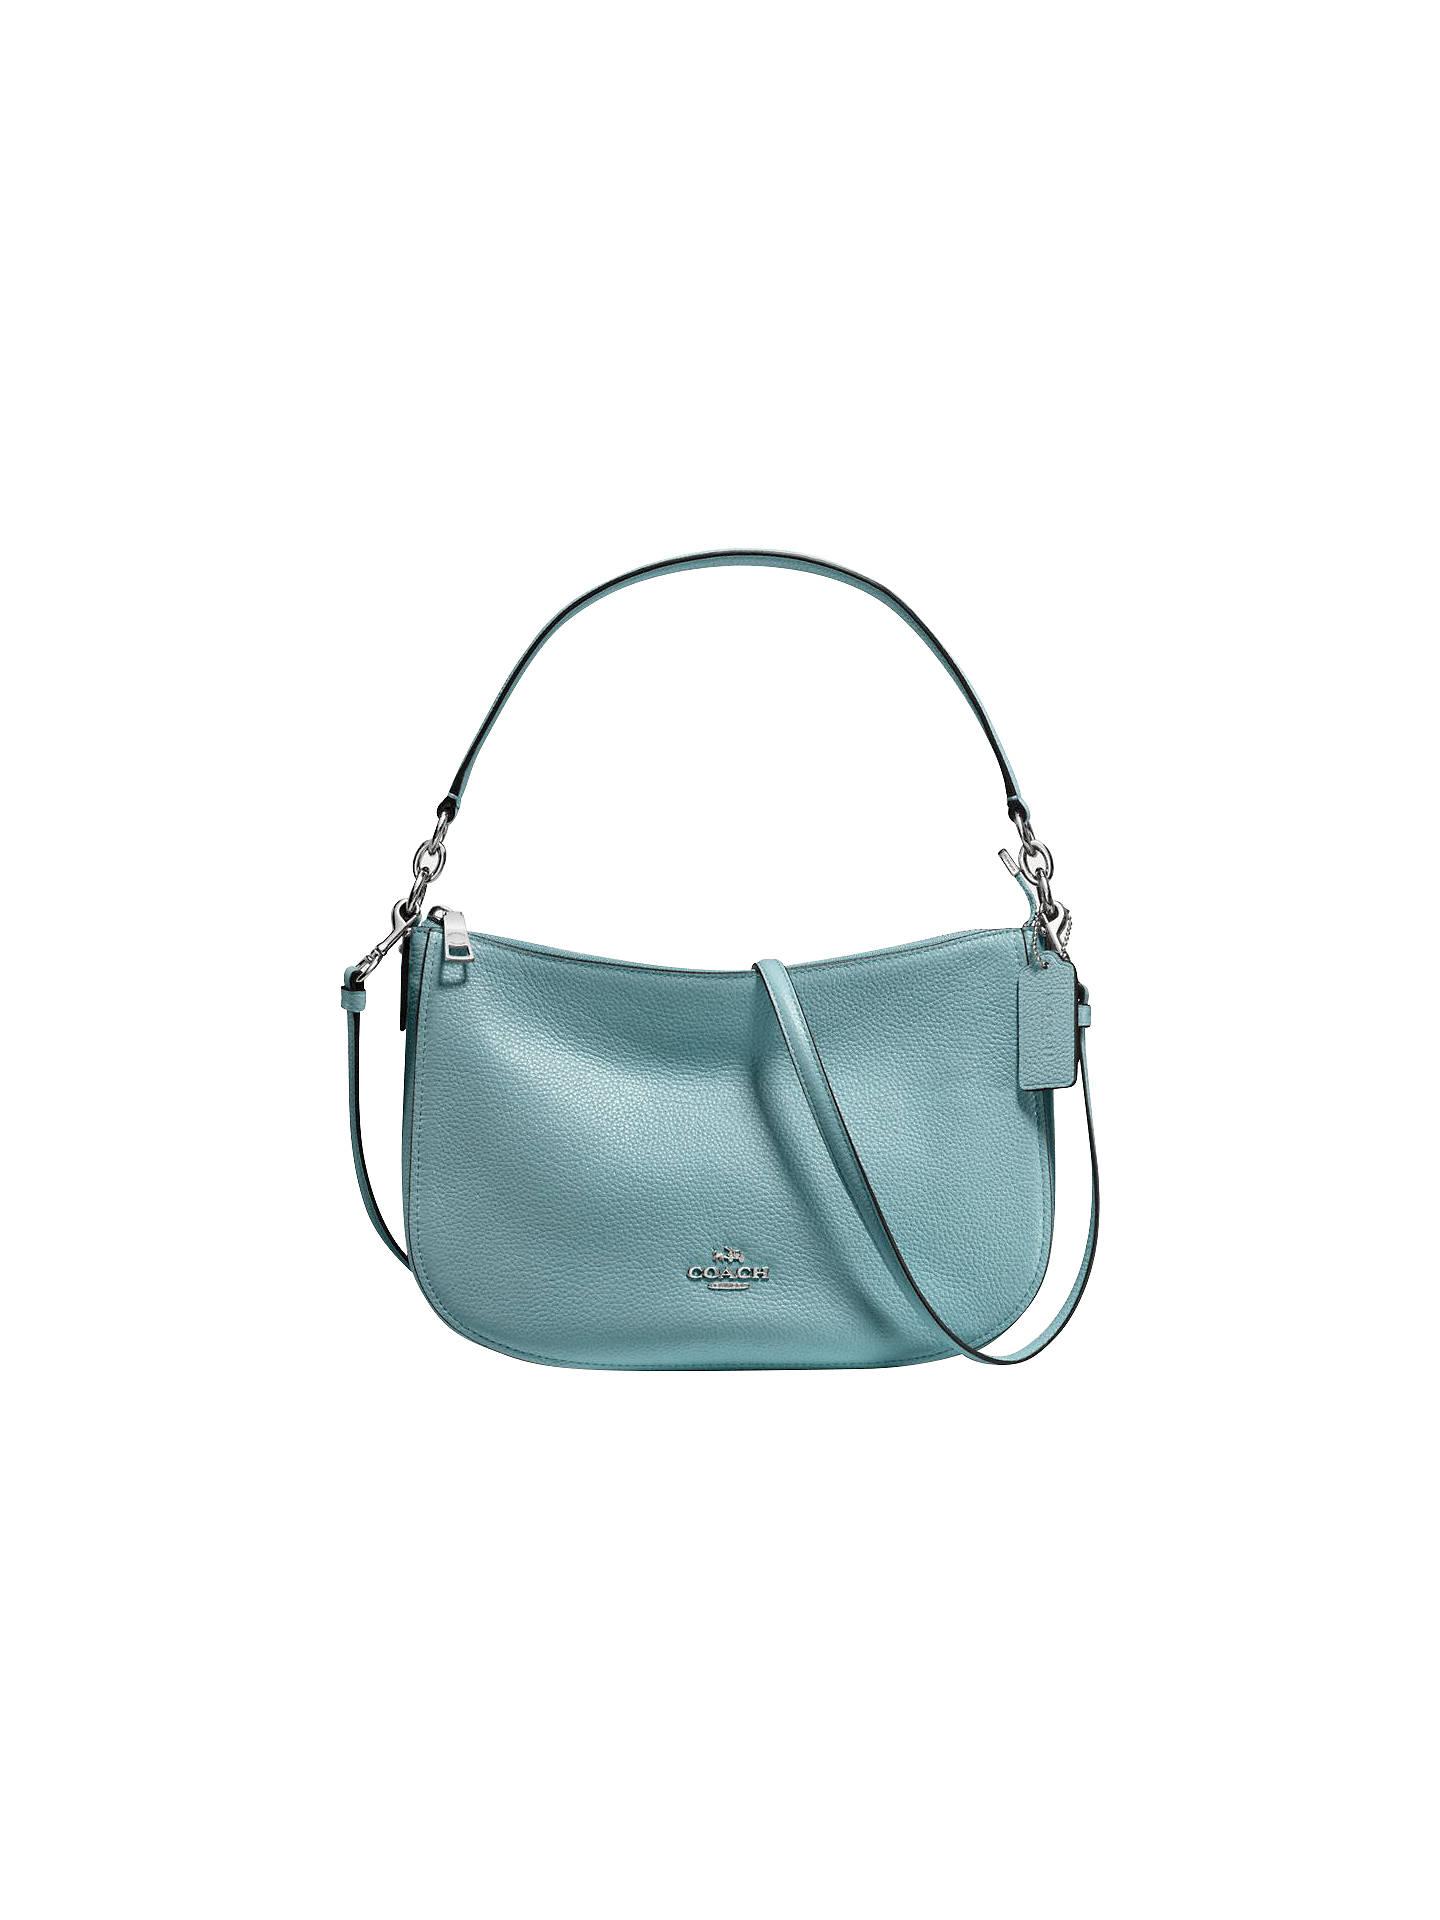 06b7b9ebd1fe3 Buy Coach Chelsea Pebble Leather Cross Body Bag, Cloud Online at  johnlewis.com